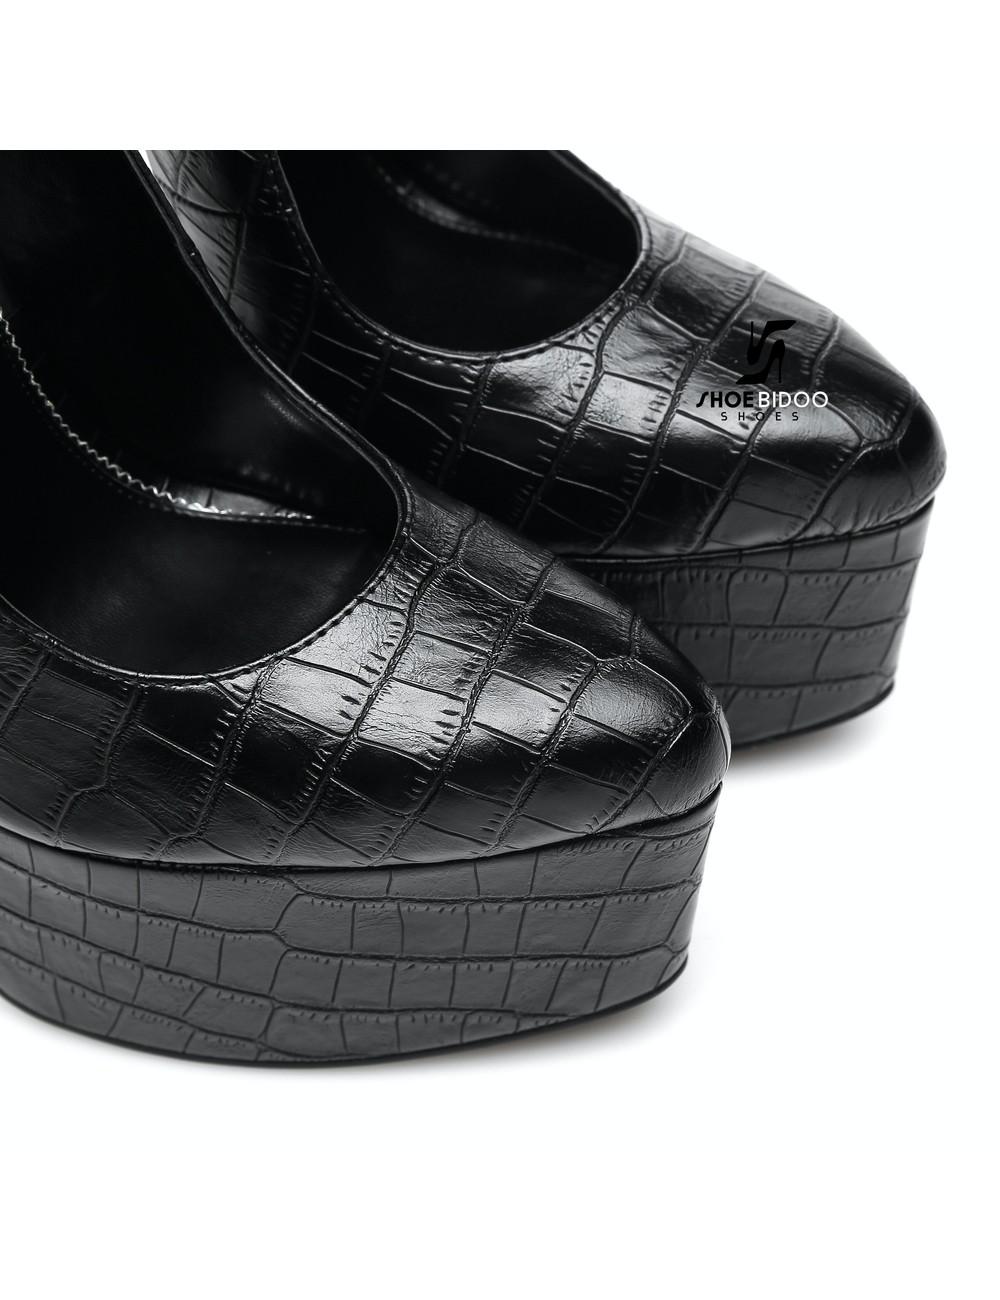 Giaro SLICK Black crocodile ESSENCE Giaro SLICK platform pumps with locking ankle strap